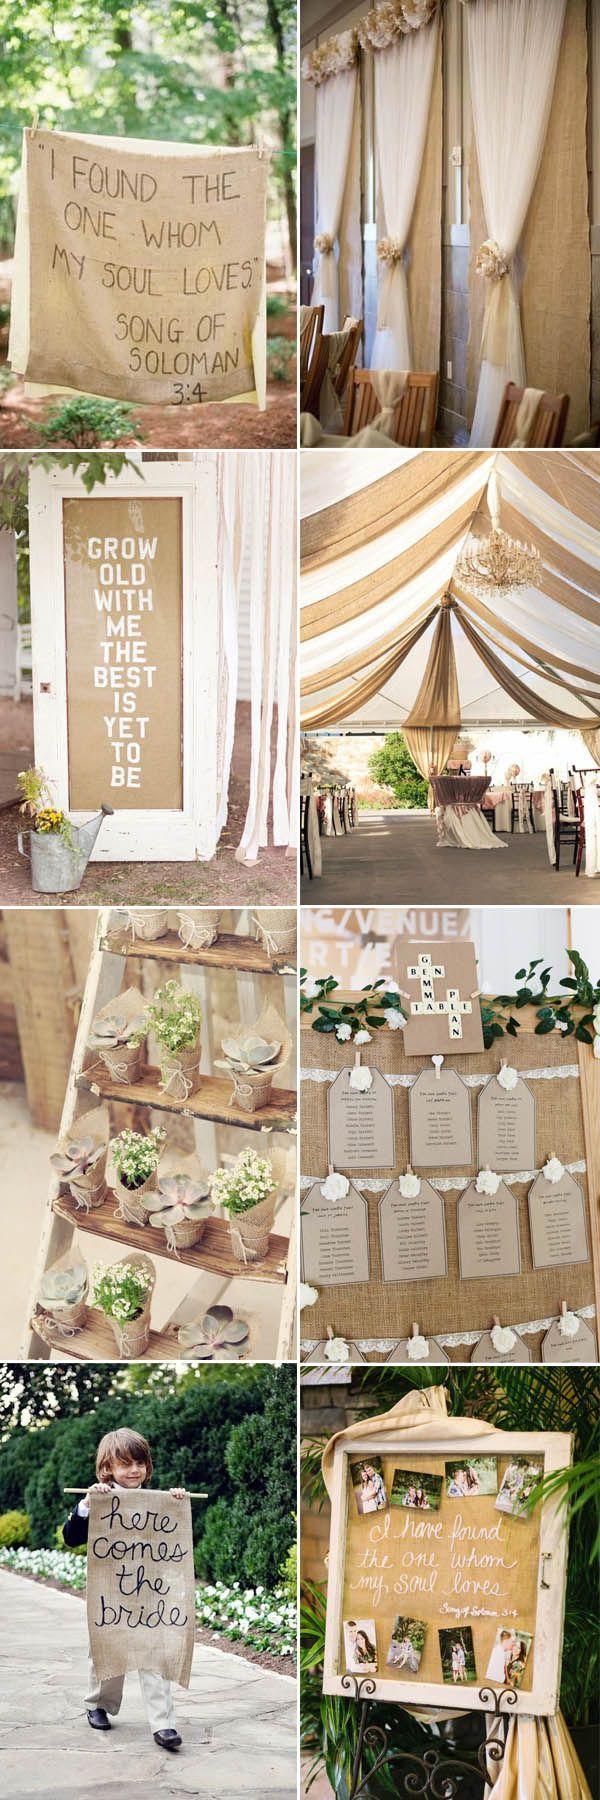 Wedding room decoration ideas 2018  awesome rustic wedding decor ideas  idée mariage   Pinterest